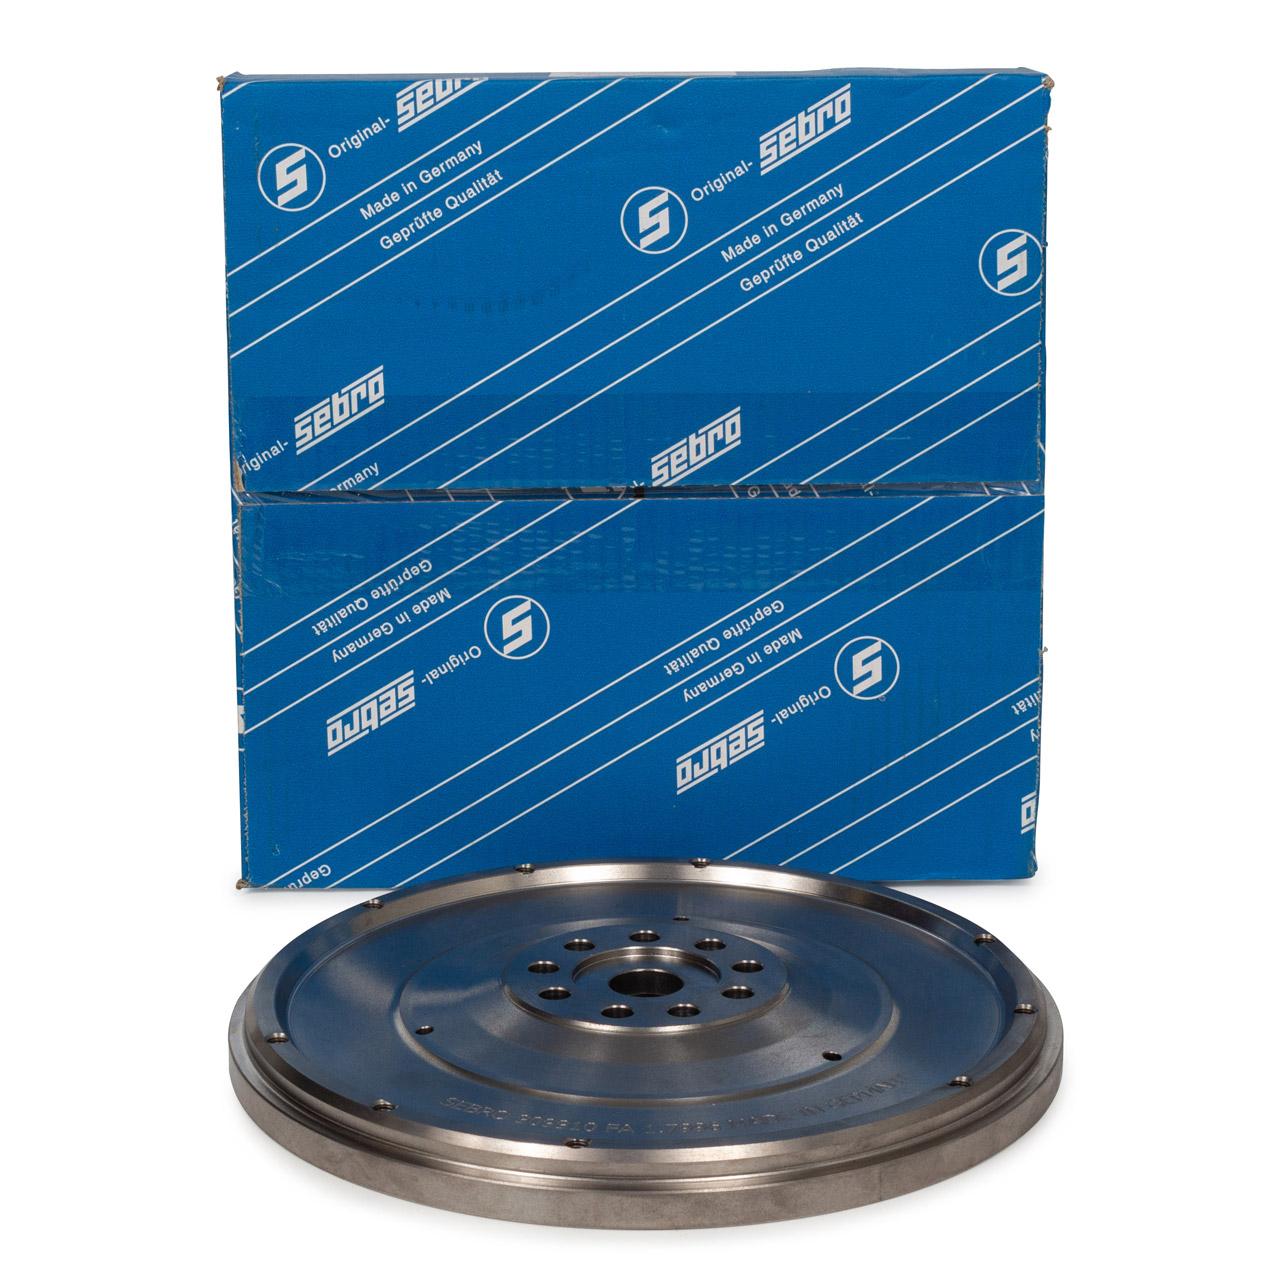 SEBRO Schwungrad für PORSCHE 911 3.3 SC Turbo 301 PS bis 1979 93010220201